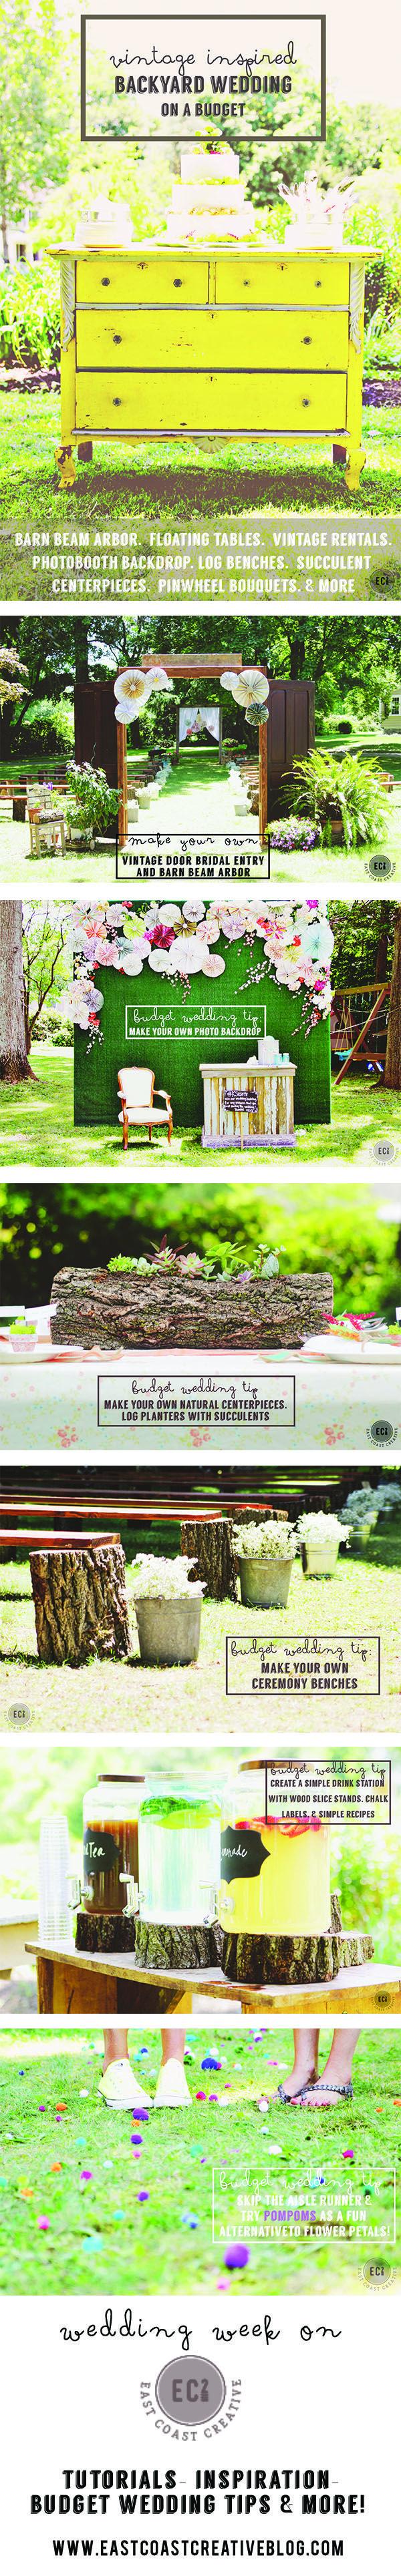 diy wedding tips on a budget vintage inspired backyard wedding